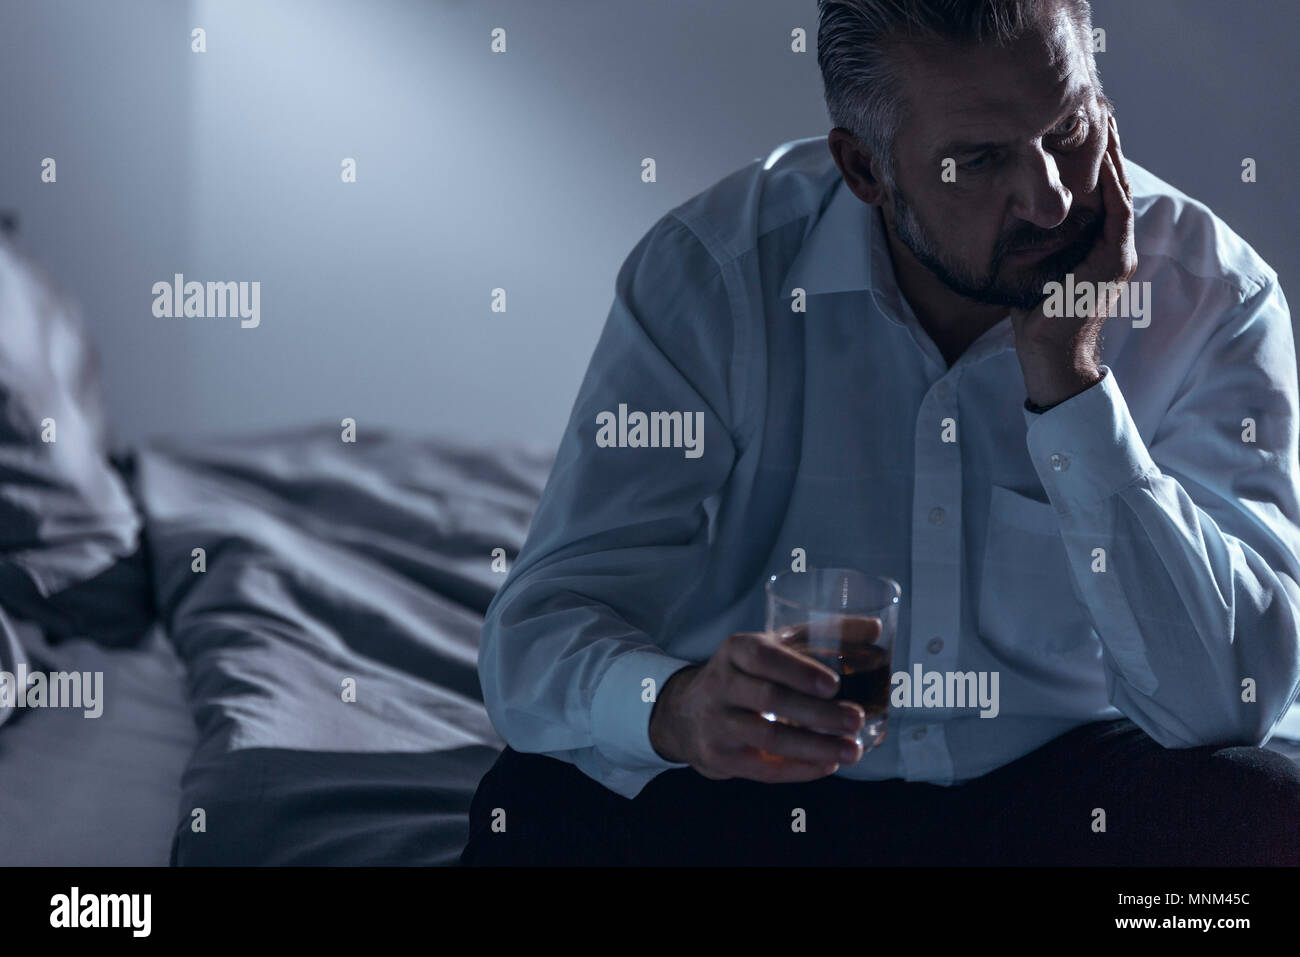 Midlife crisis männer körperliche symptome